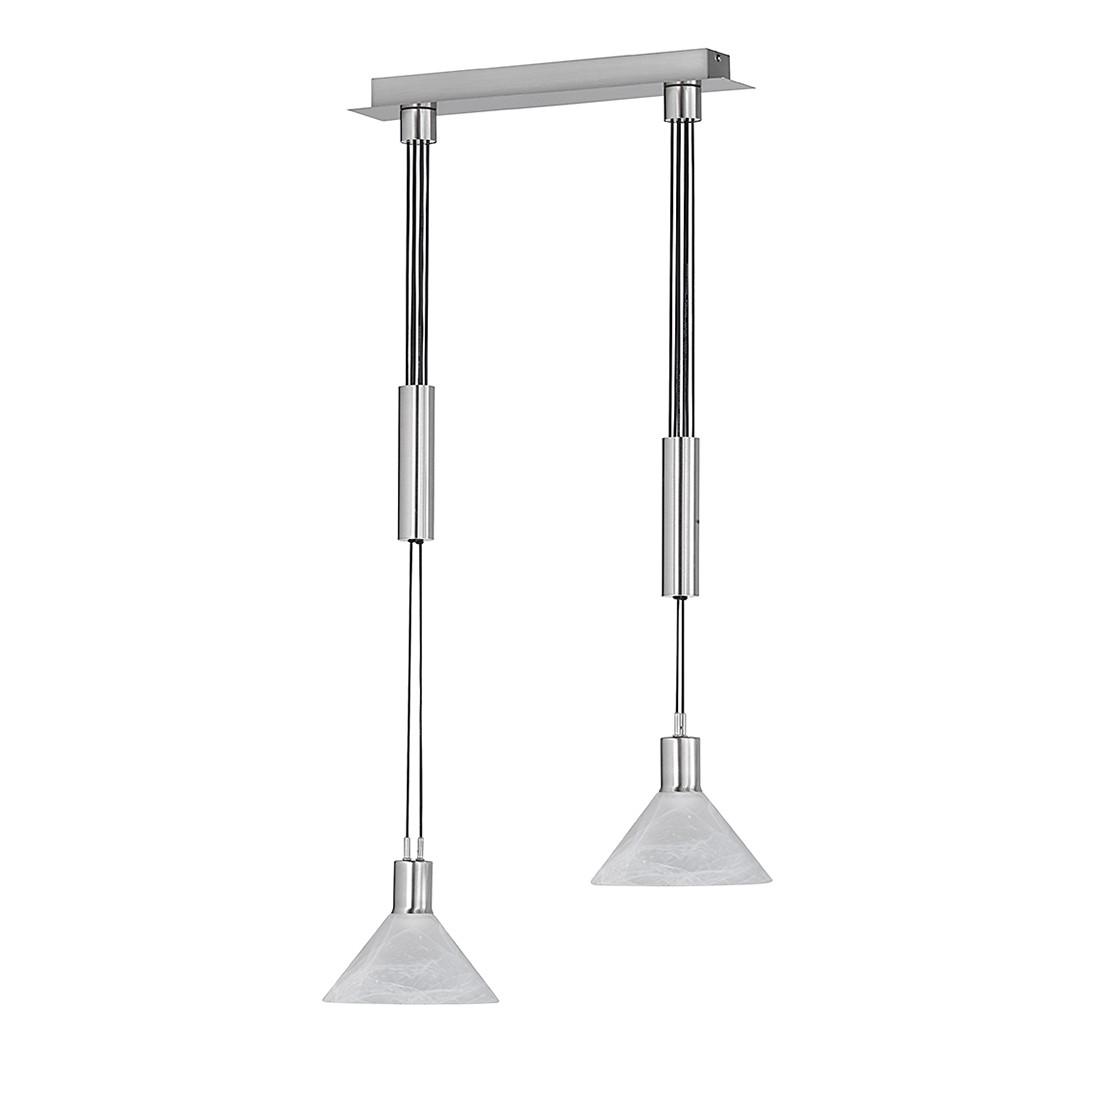 energie A+, Hanglamp MAINE metaal-glas 2 lichtbronnen, Action